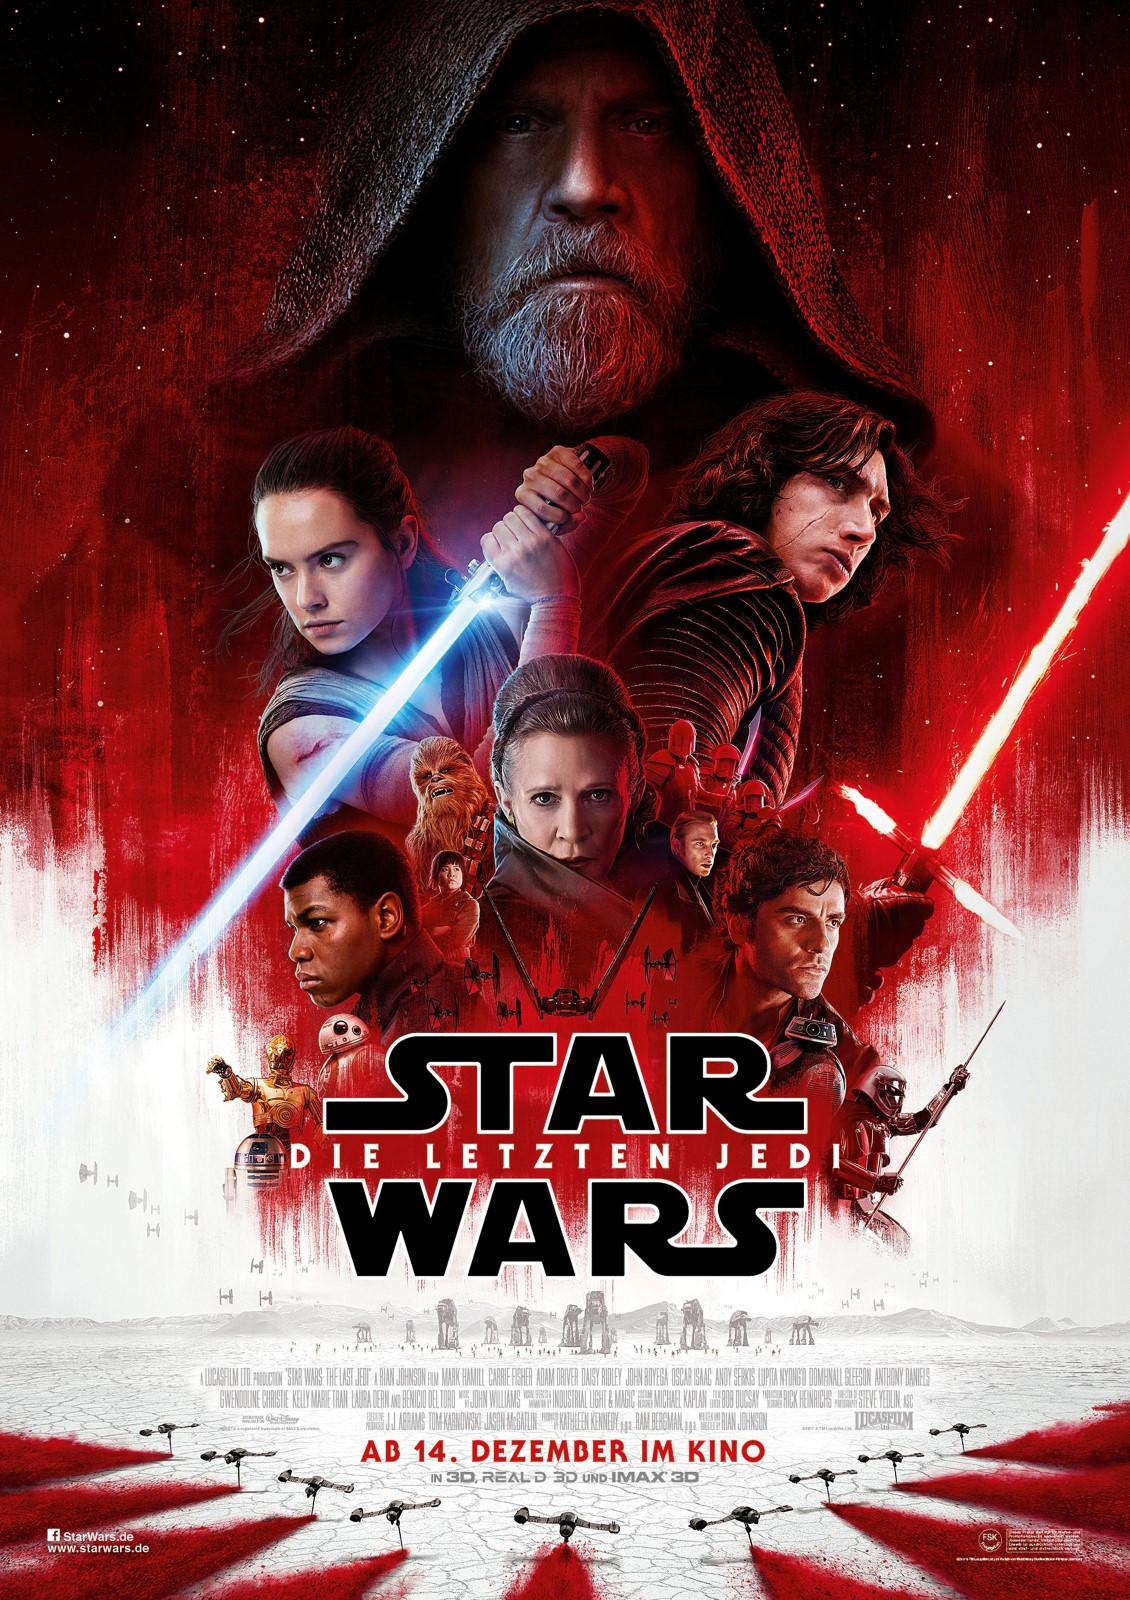 Star Wars 8 Die Letzten Jedi Film 2017 Filmstarts De